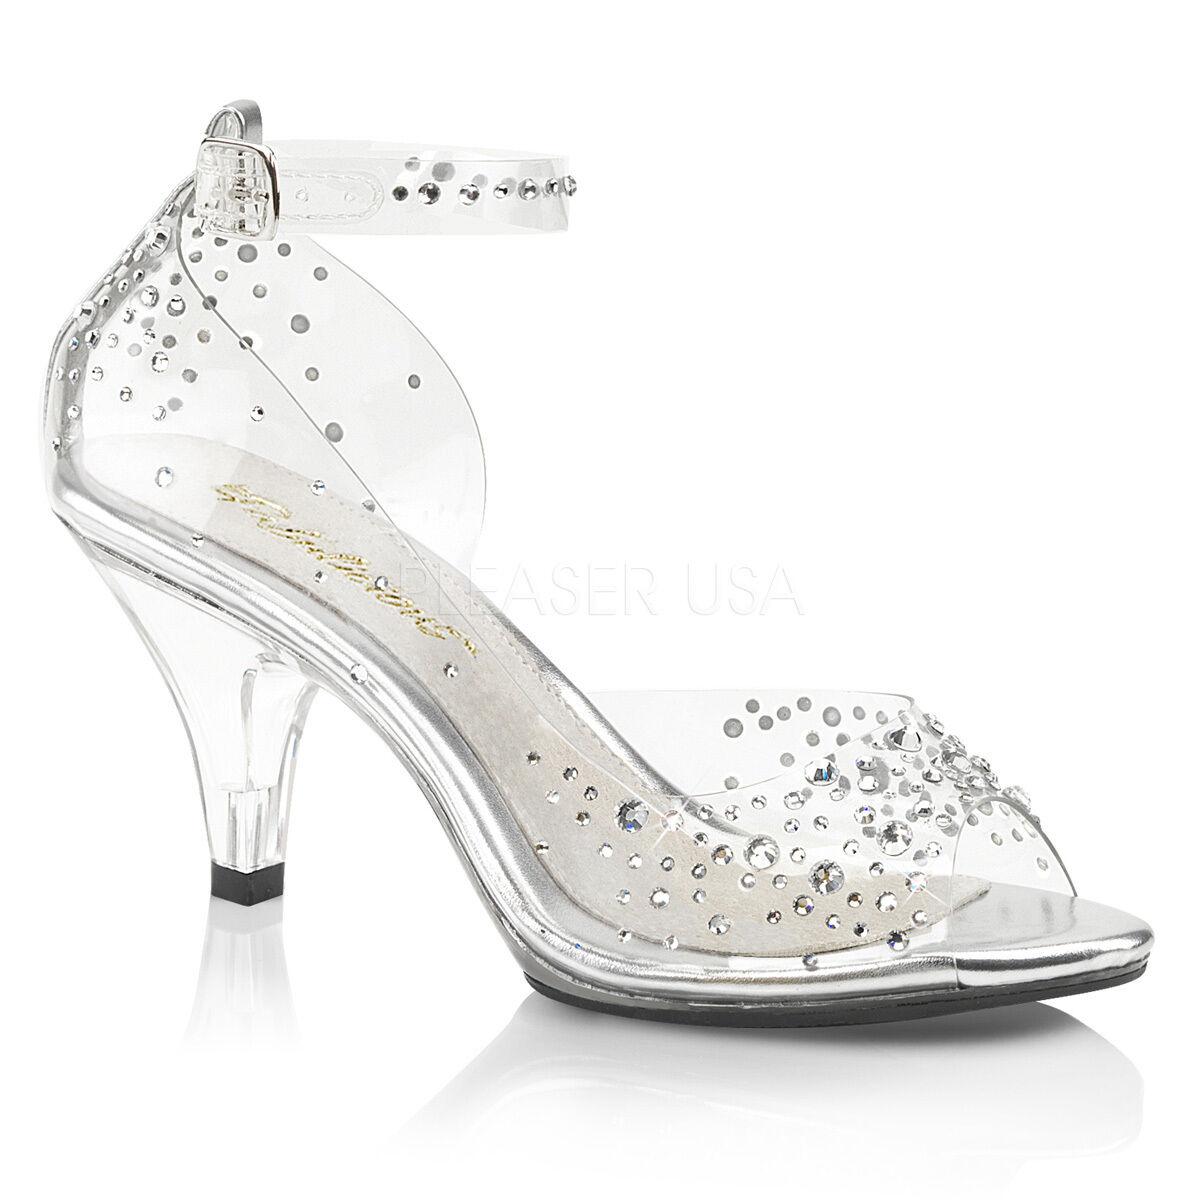 Clear Cinderella Shoes Disney Princess Glass Slippers Mens Drag Queen Heel 14 15